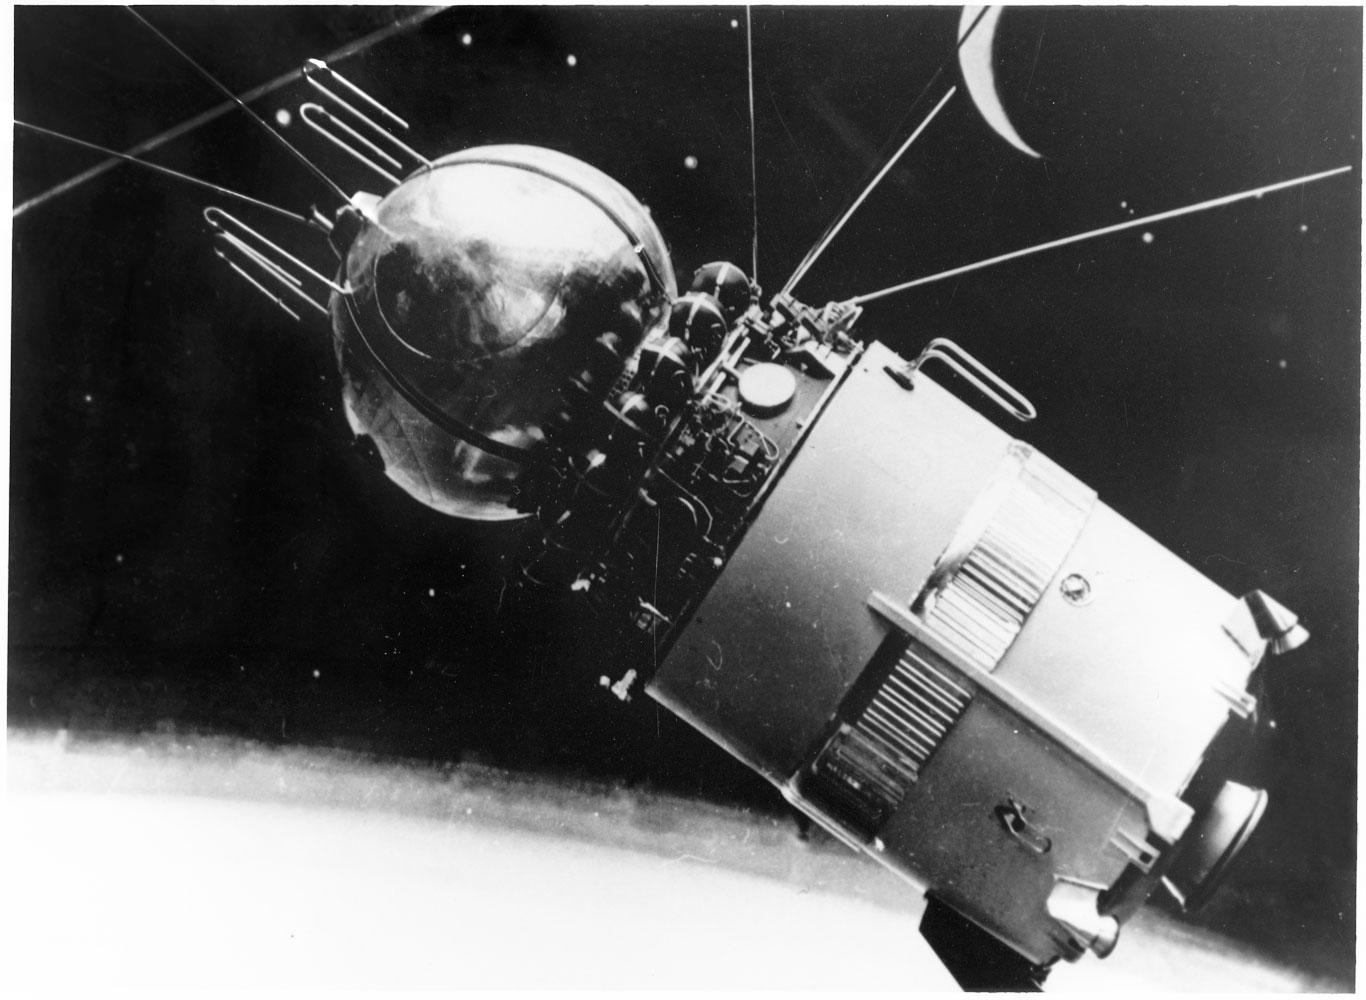 An illustration of the Vostok in flight